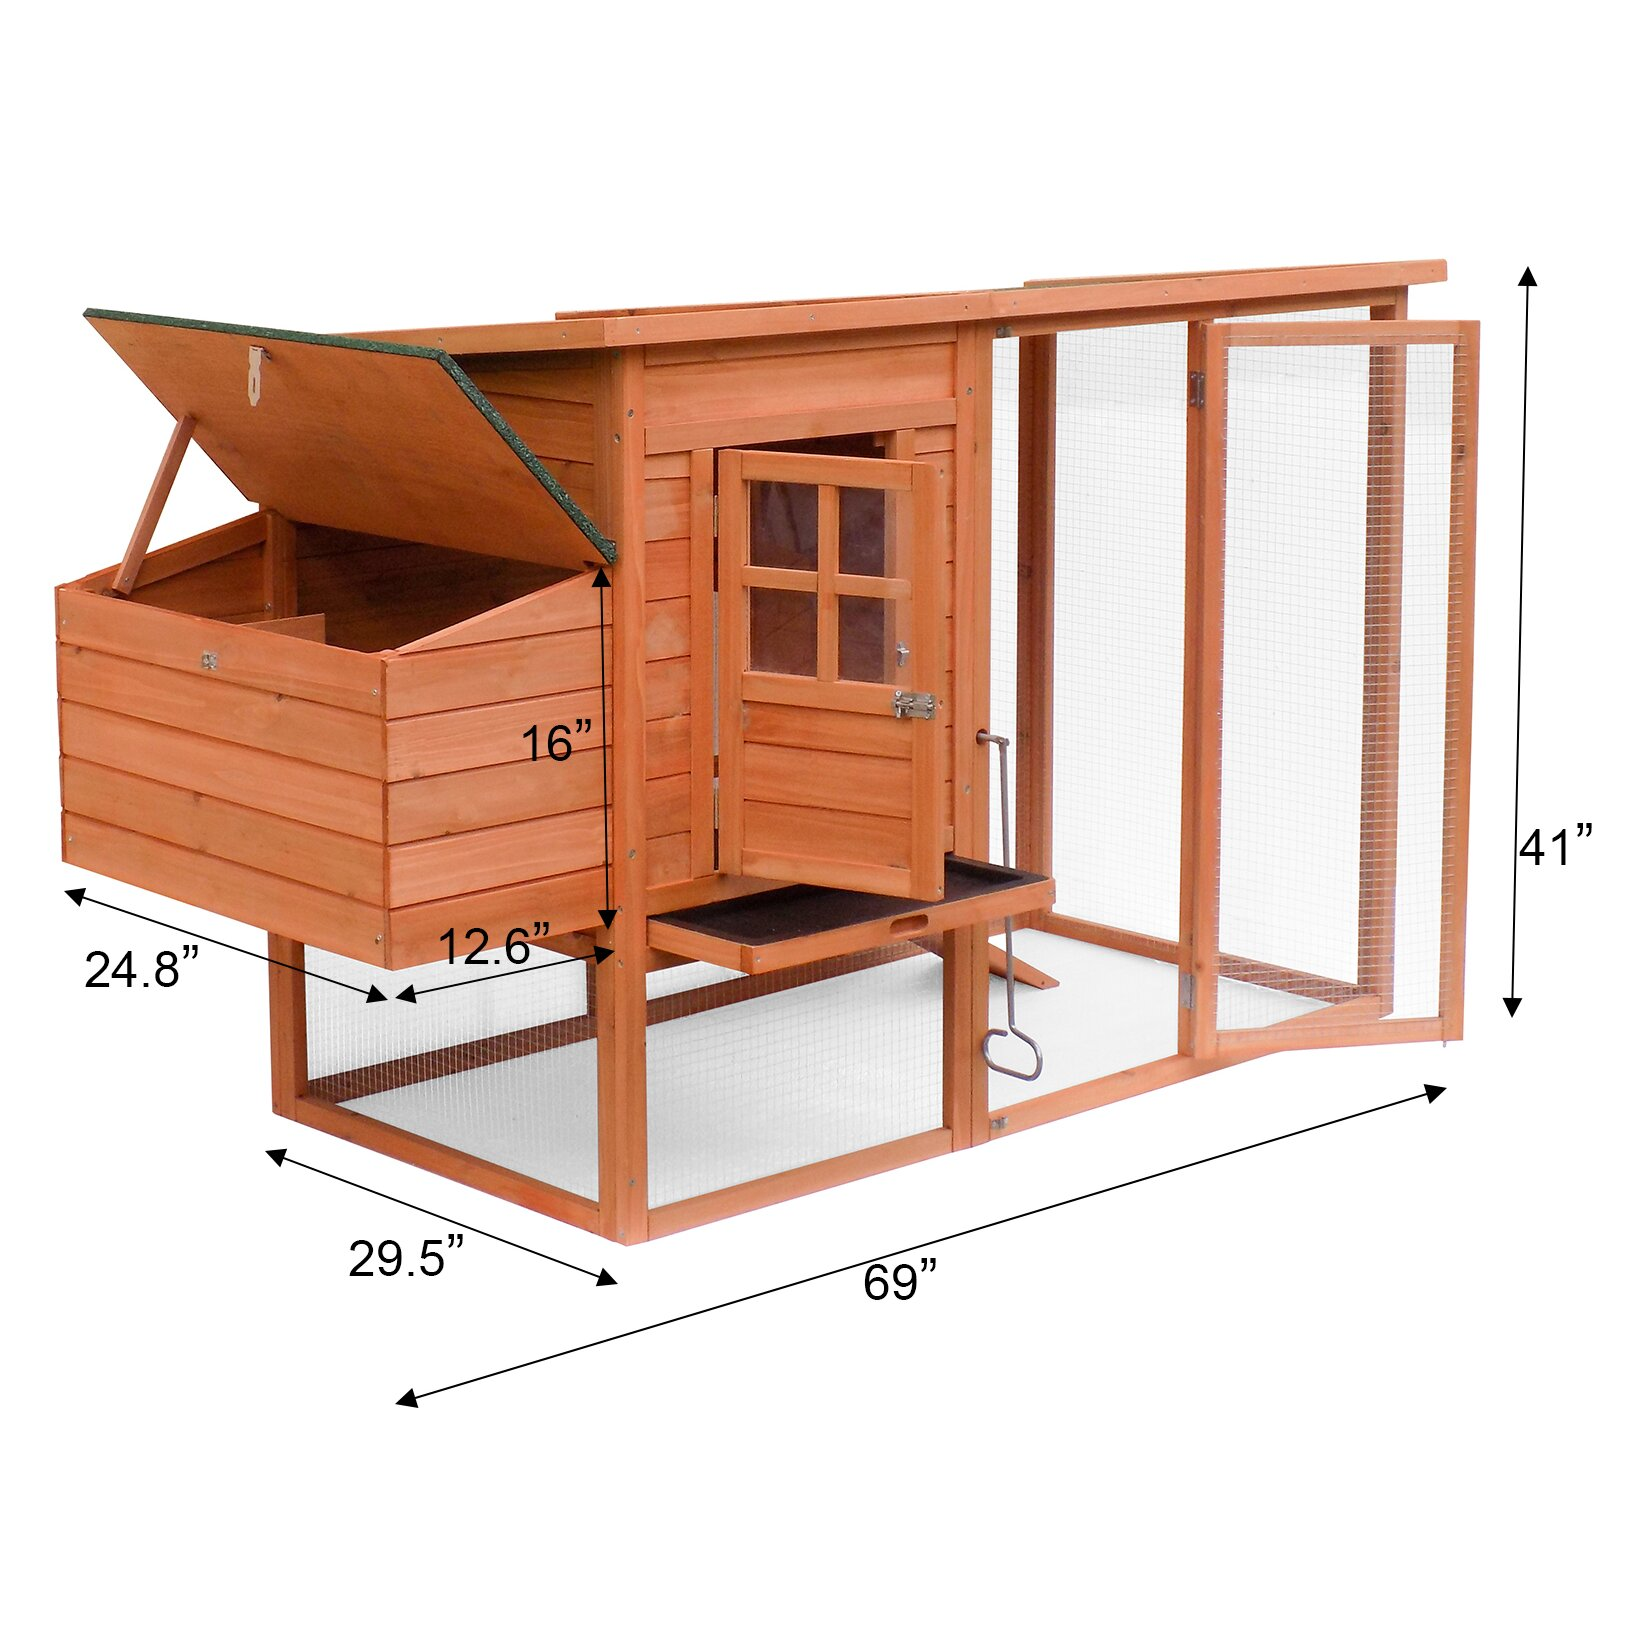 Merax Large Wooden Chicken Coop With Nesting Box Wayfair